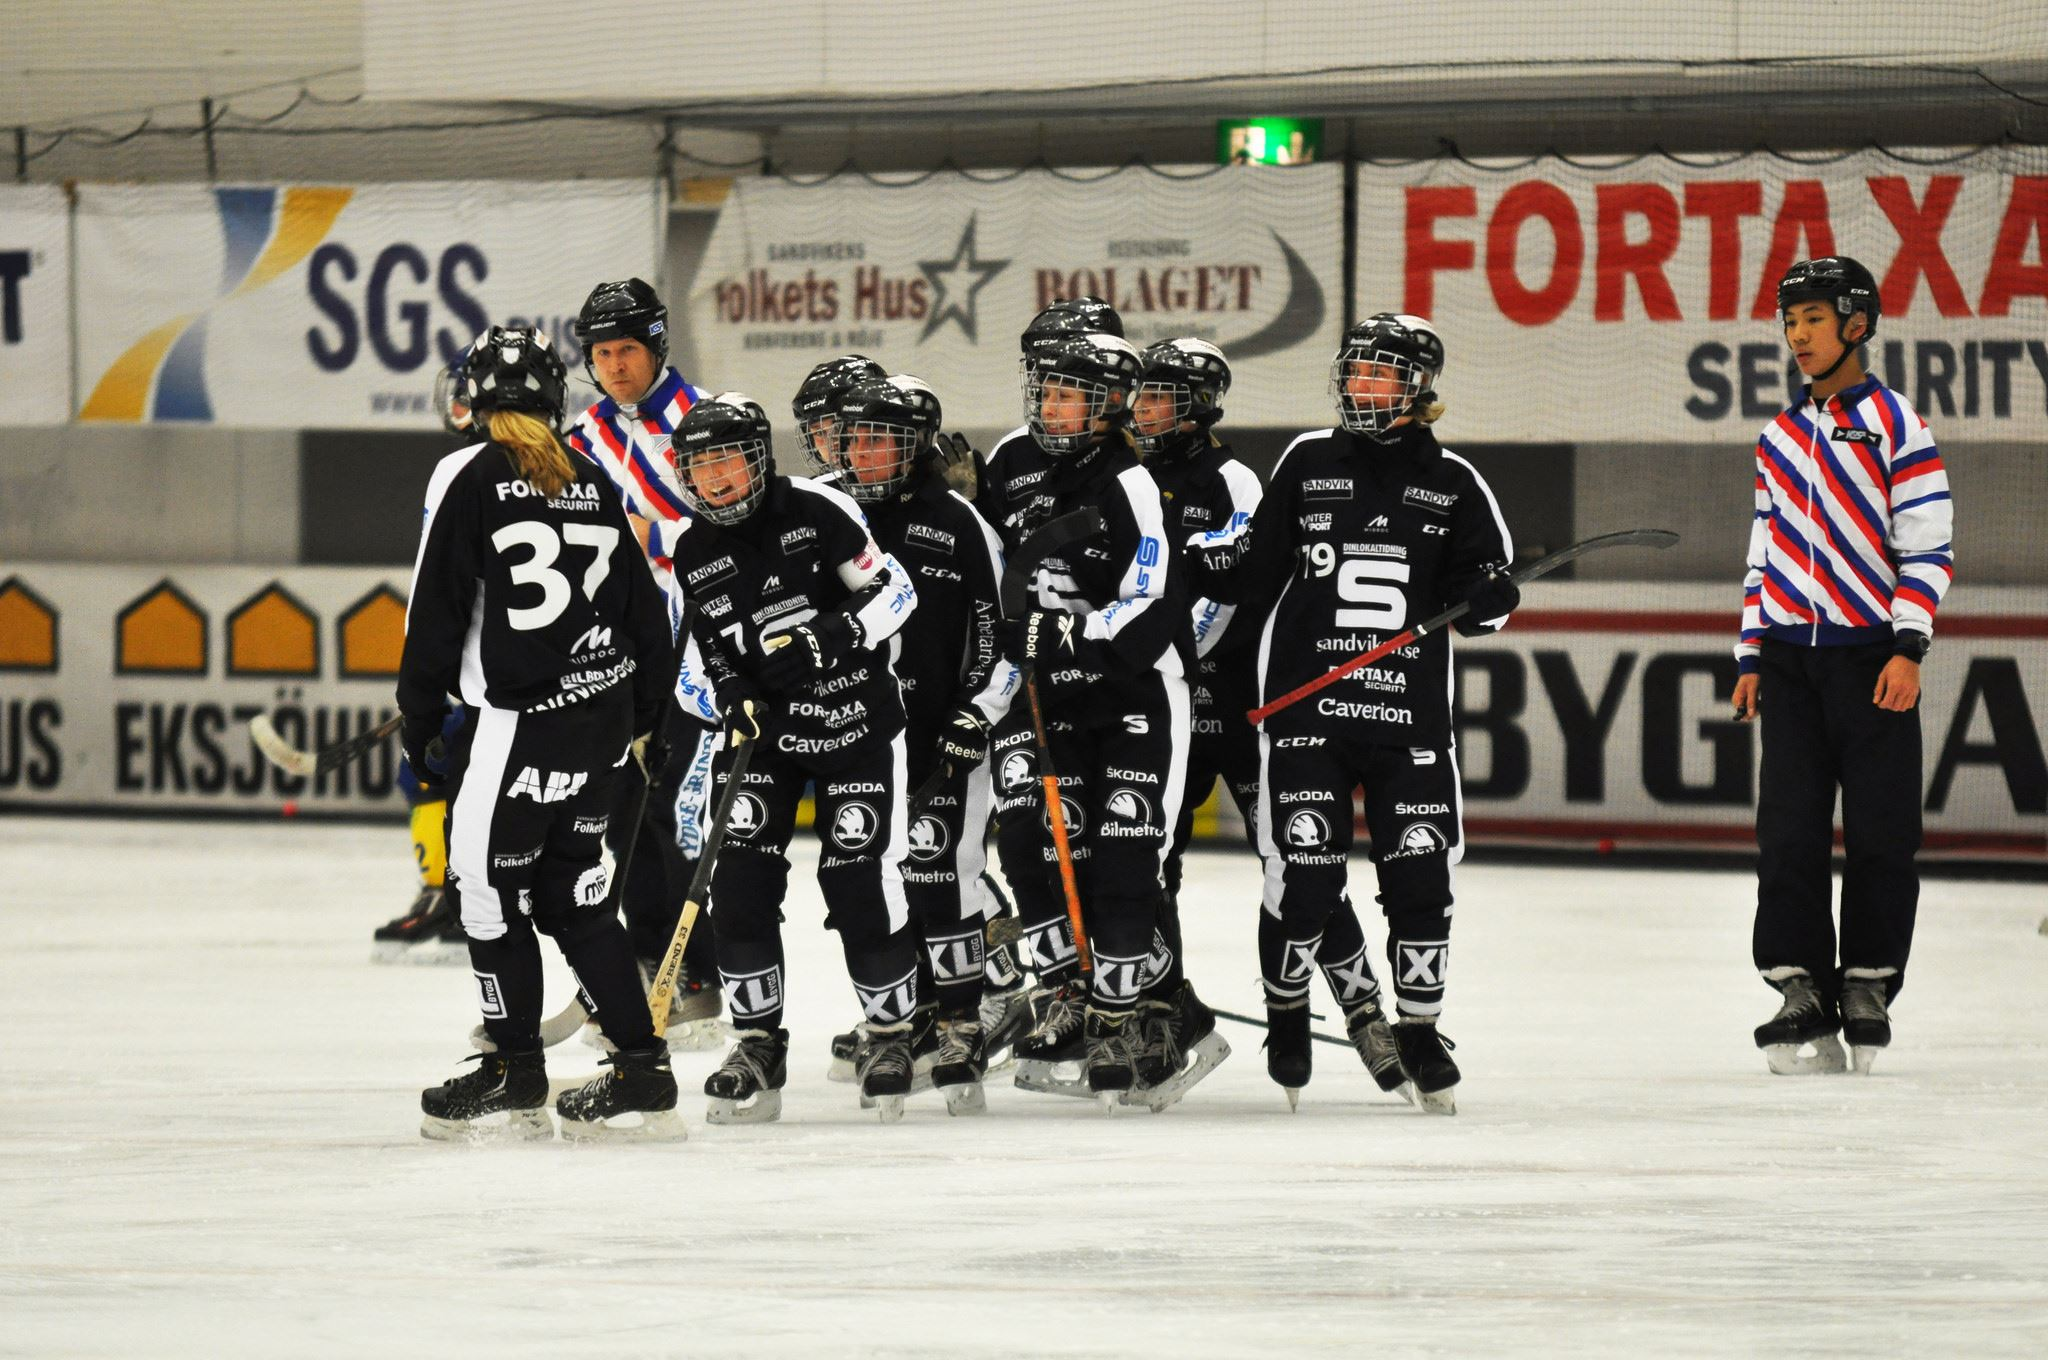 SAIK Bandy - Västerås